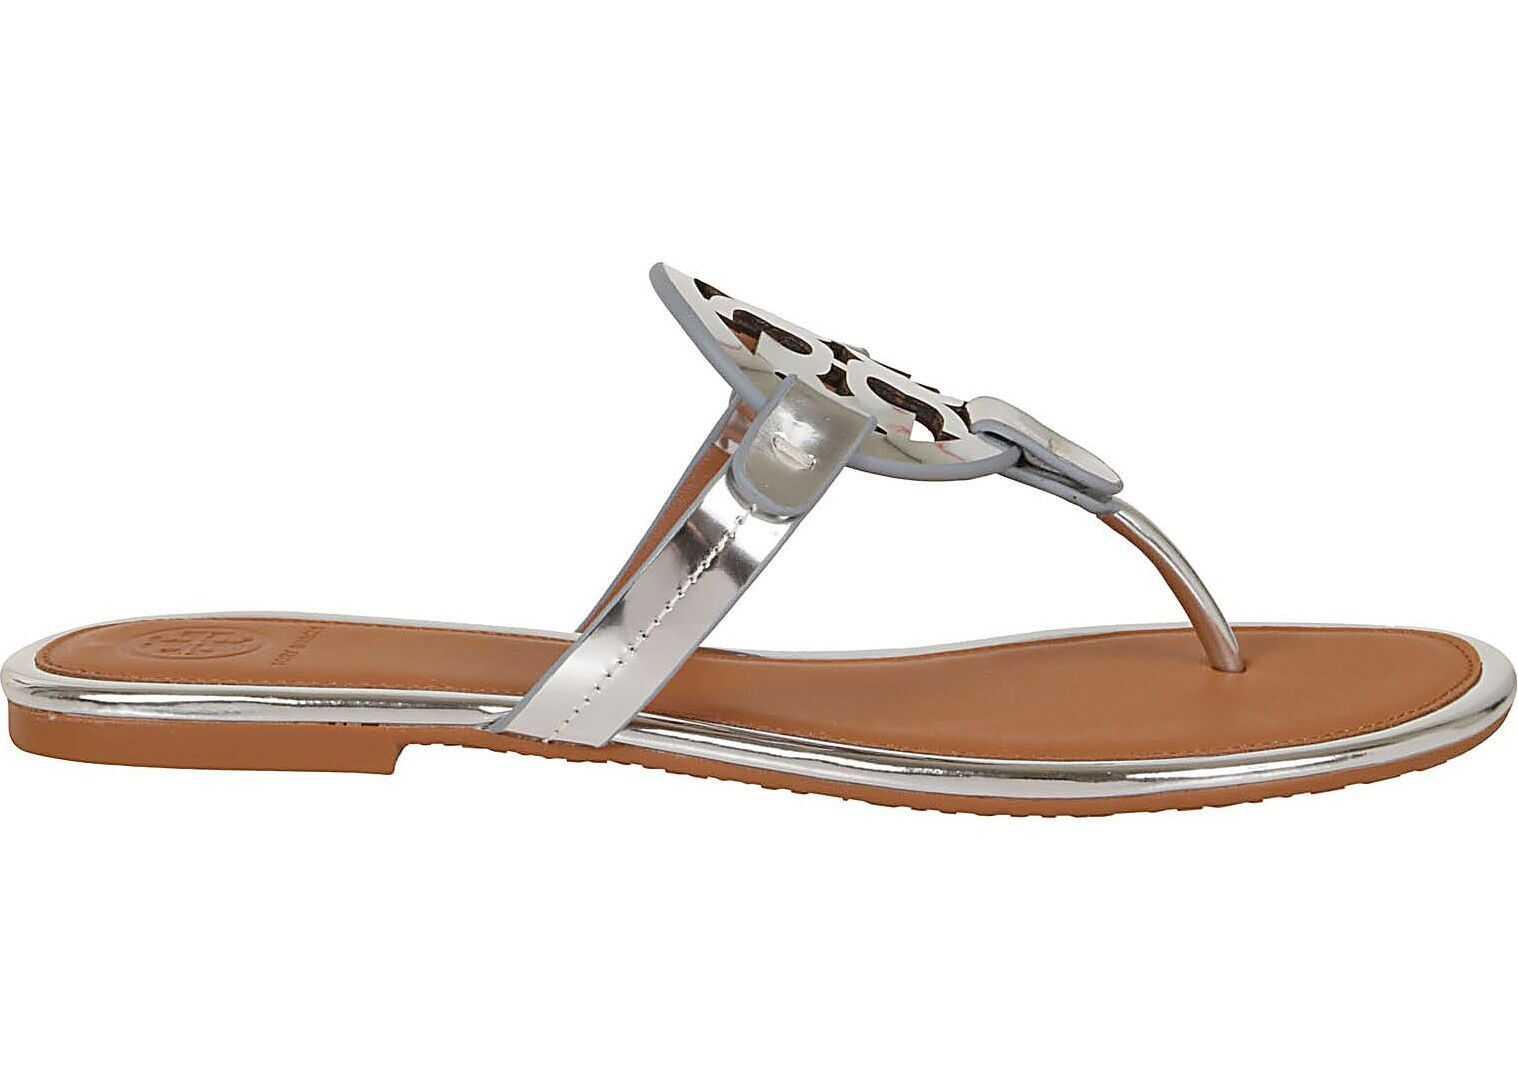 Tory Burch Leather Flip Flops SILVER